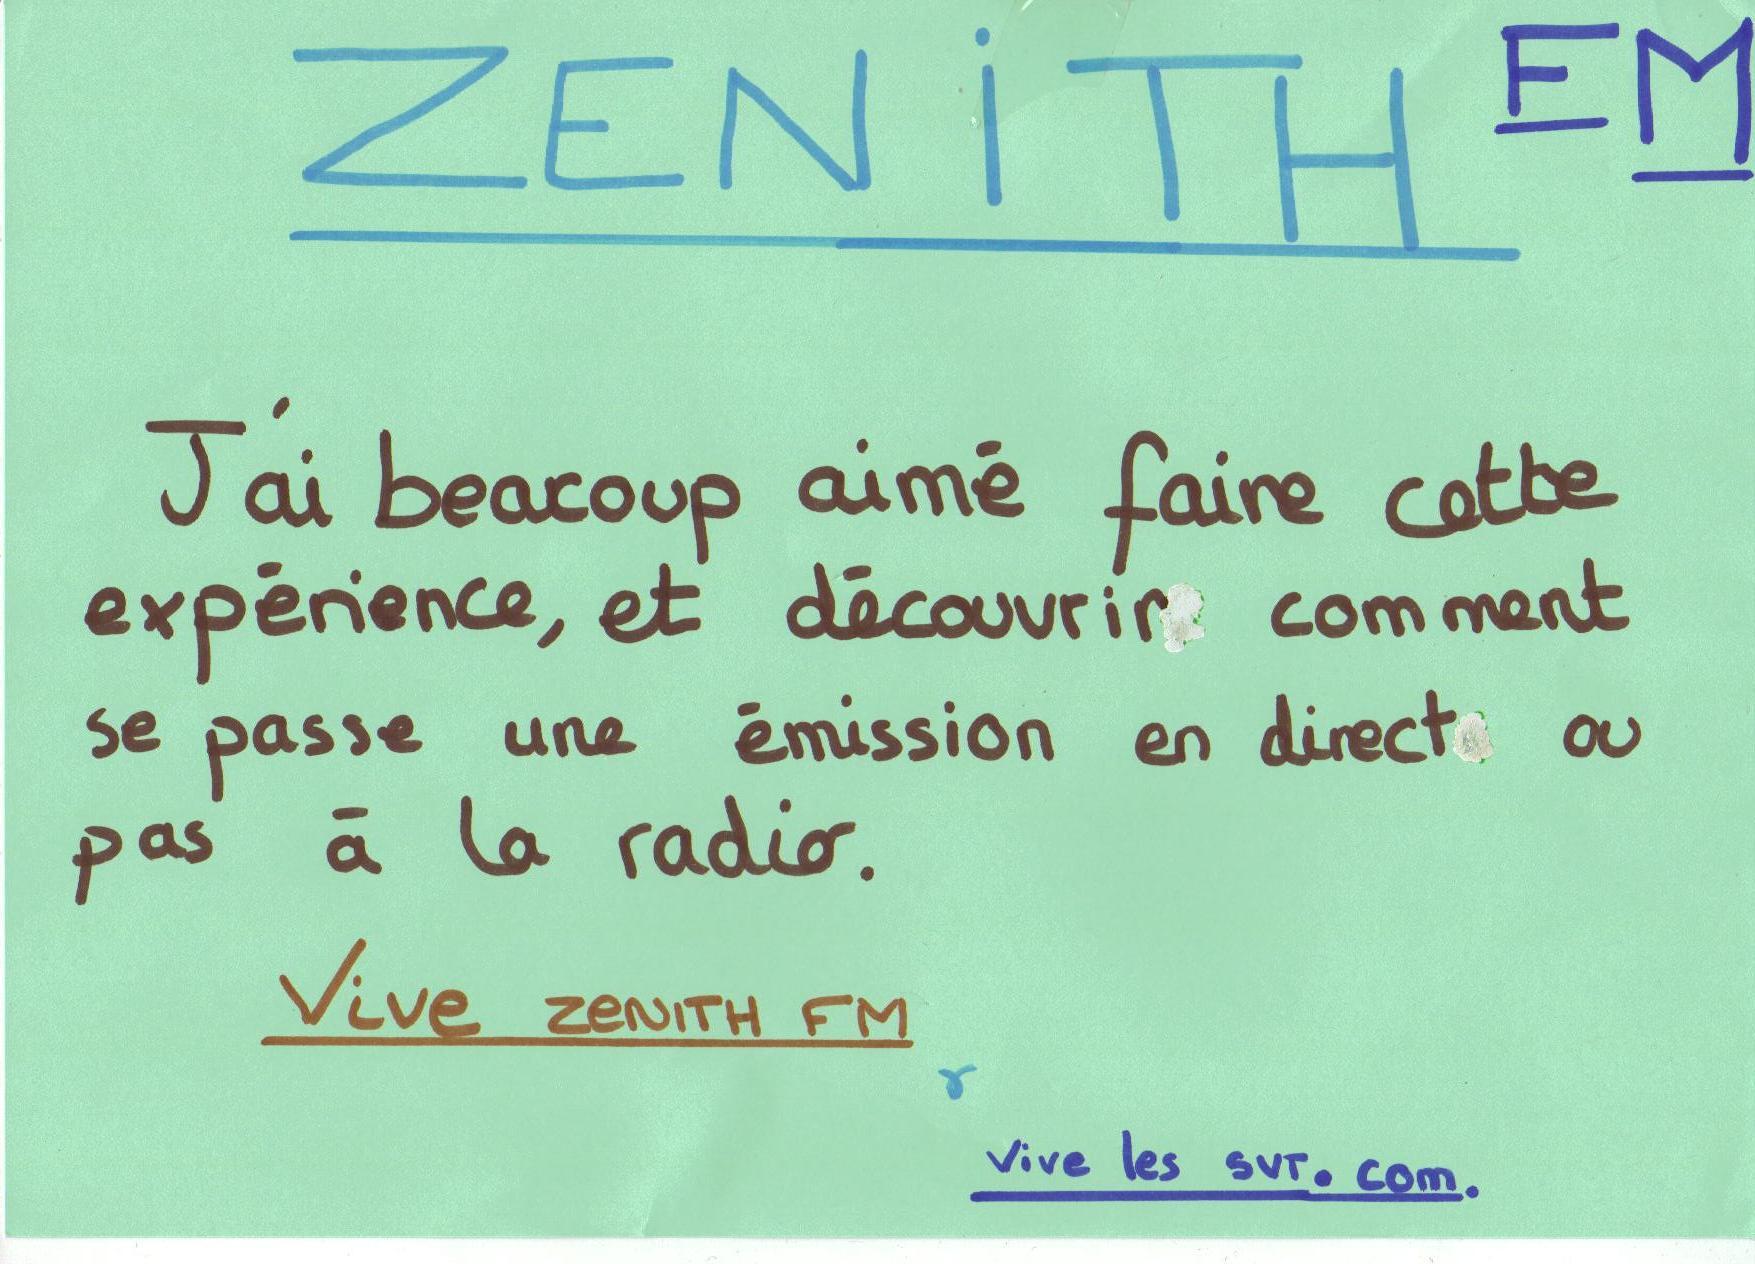 zenith-fm-reactions